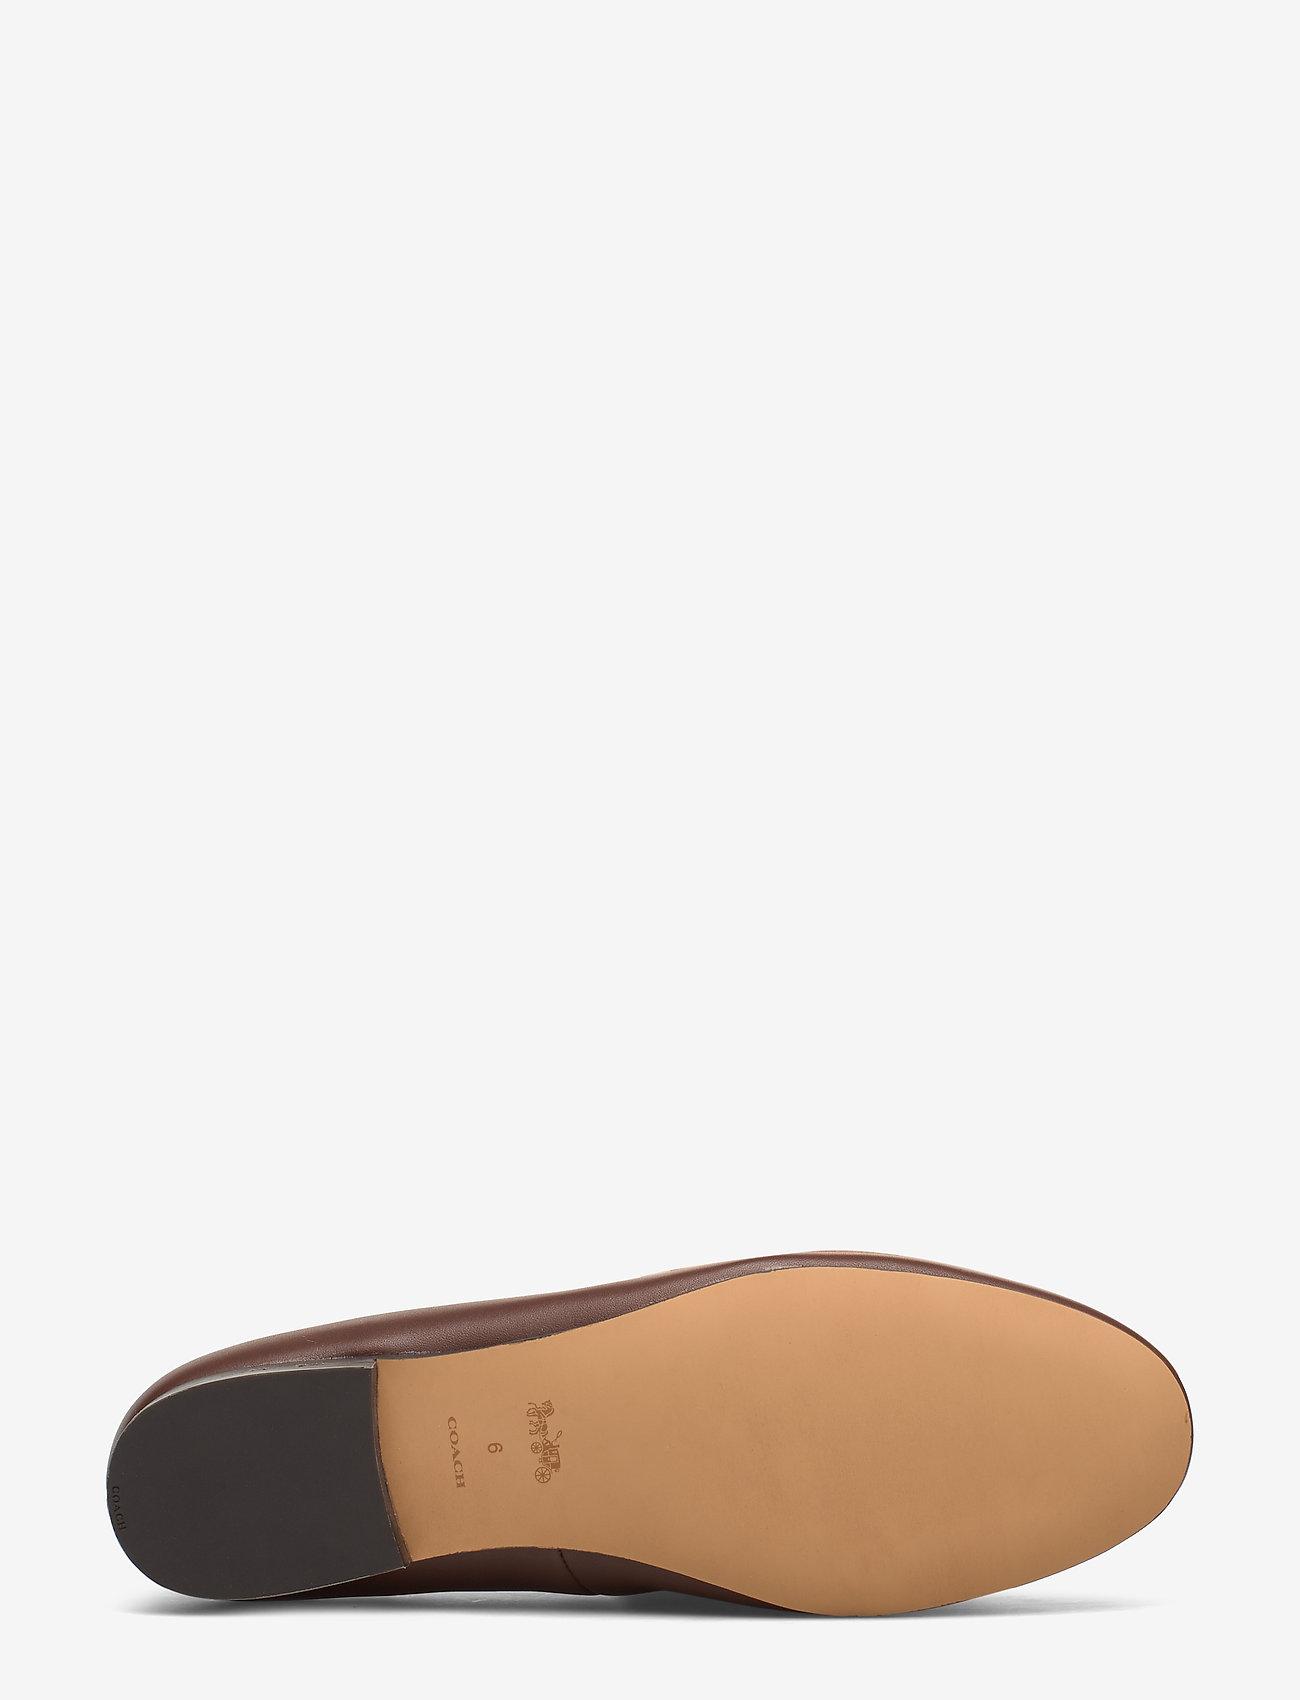 Harper Beadchain Loafer- Signature Mix (Dark Saddle/tan) - Coach